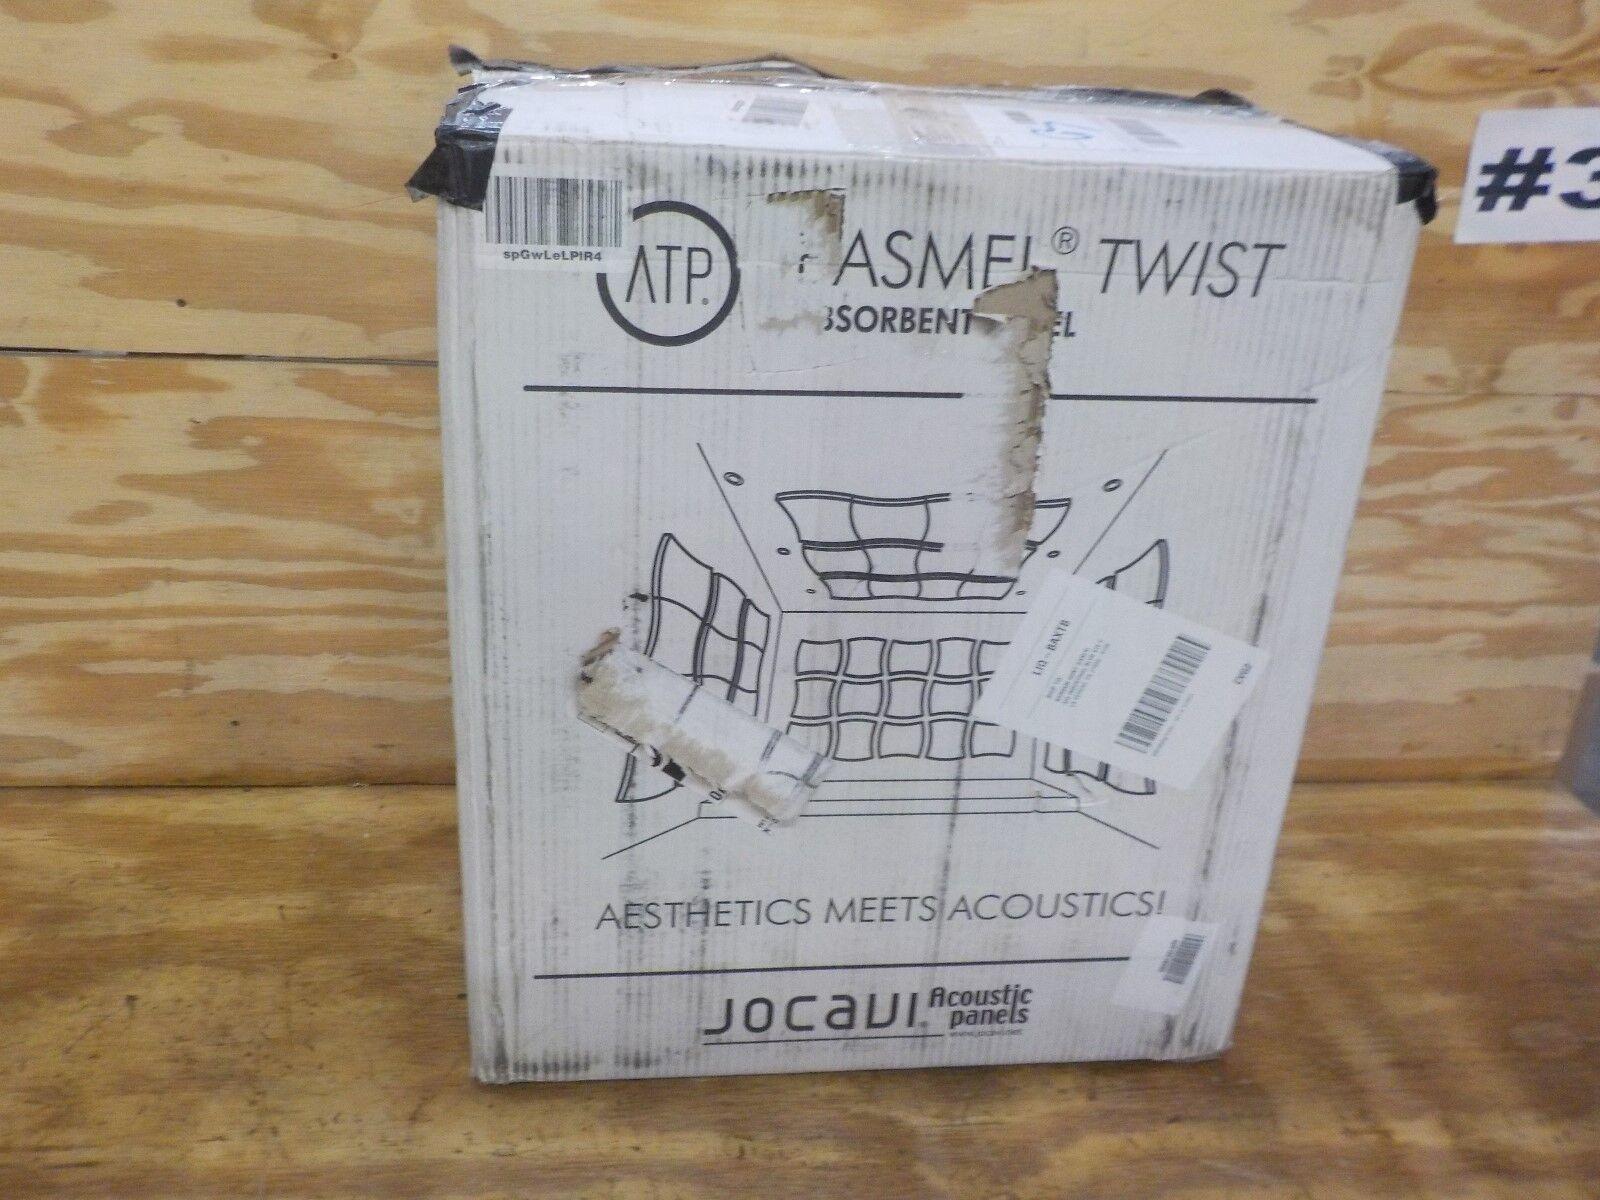 JOCAVI Akustische Panels Basmel Twist Acoustic Foam Sound Absorbing Panel mit Rot